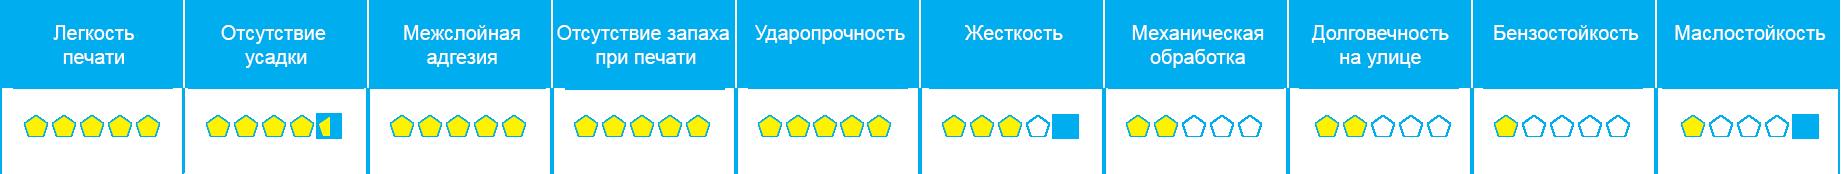 Описание СБС-2